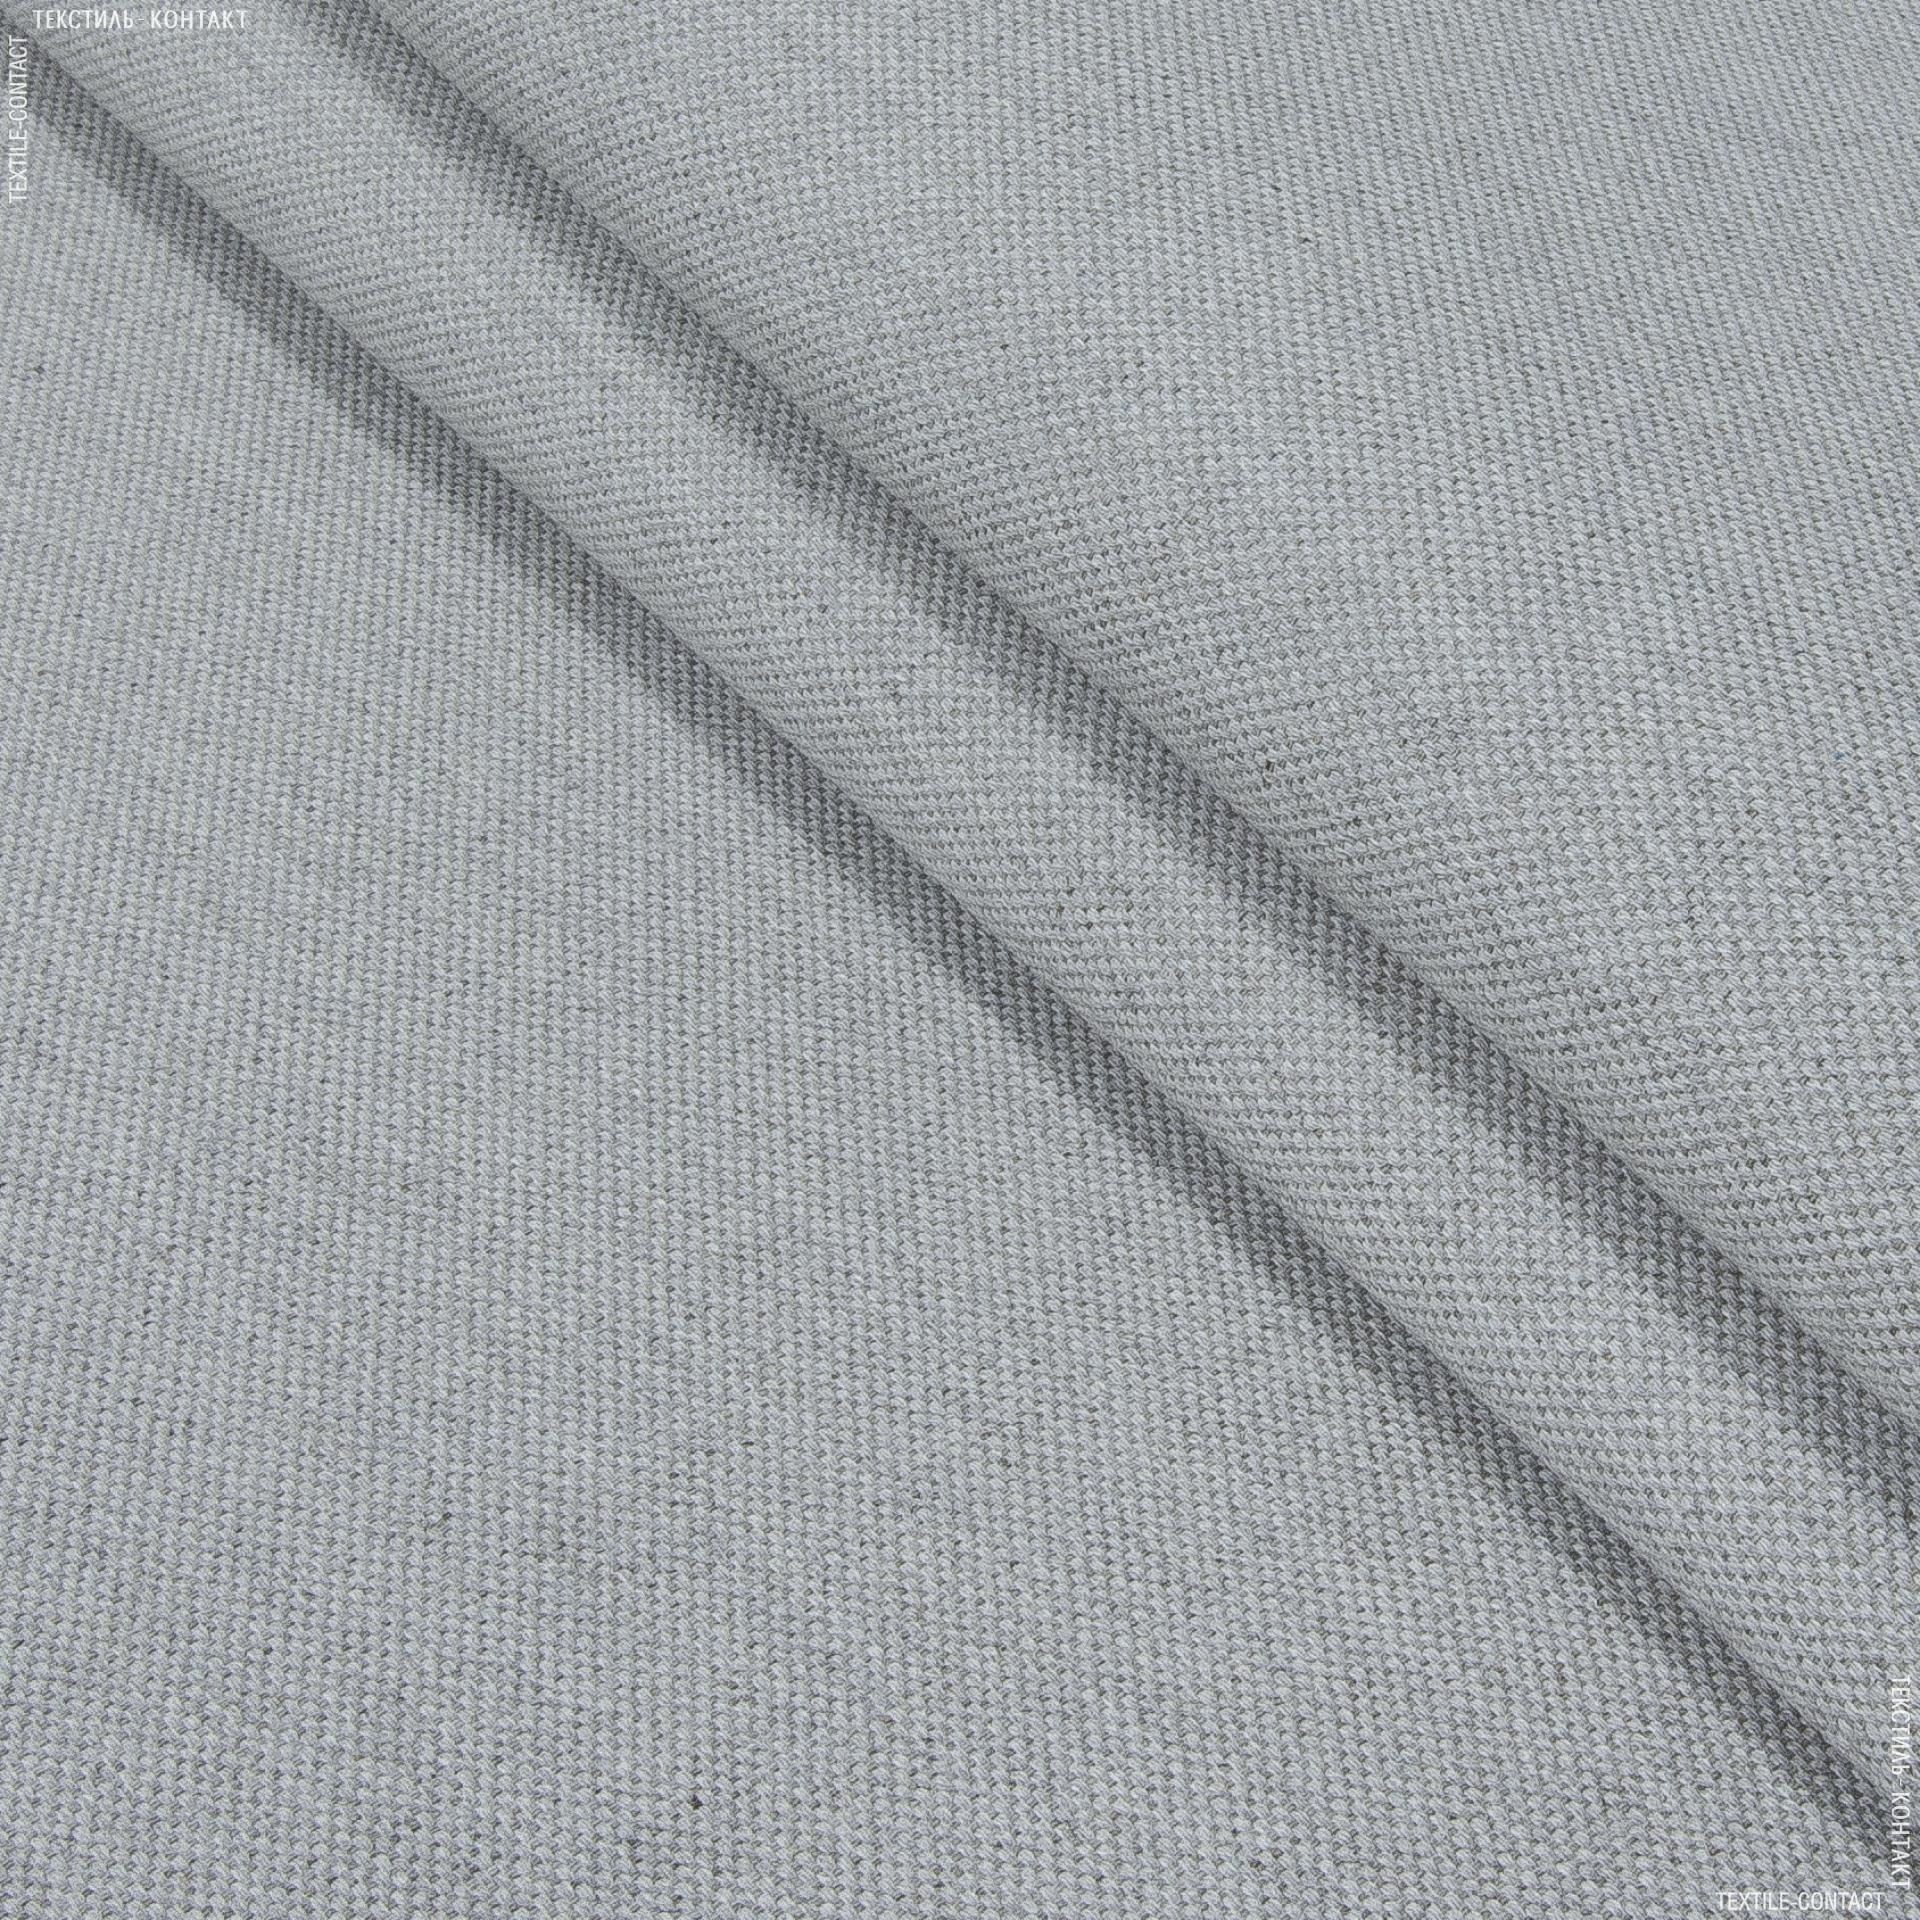 Ткани для маркиз - Декоративная ткань  оскар  св.серый